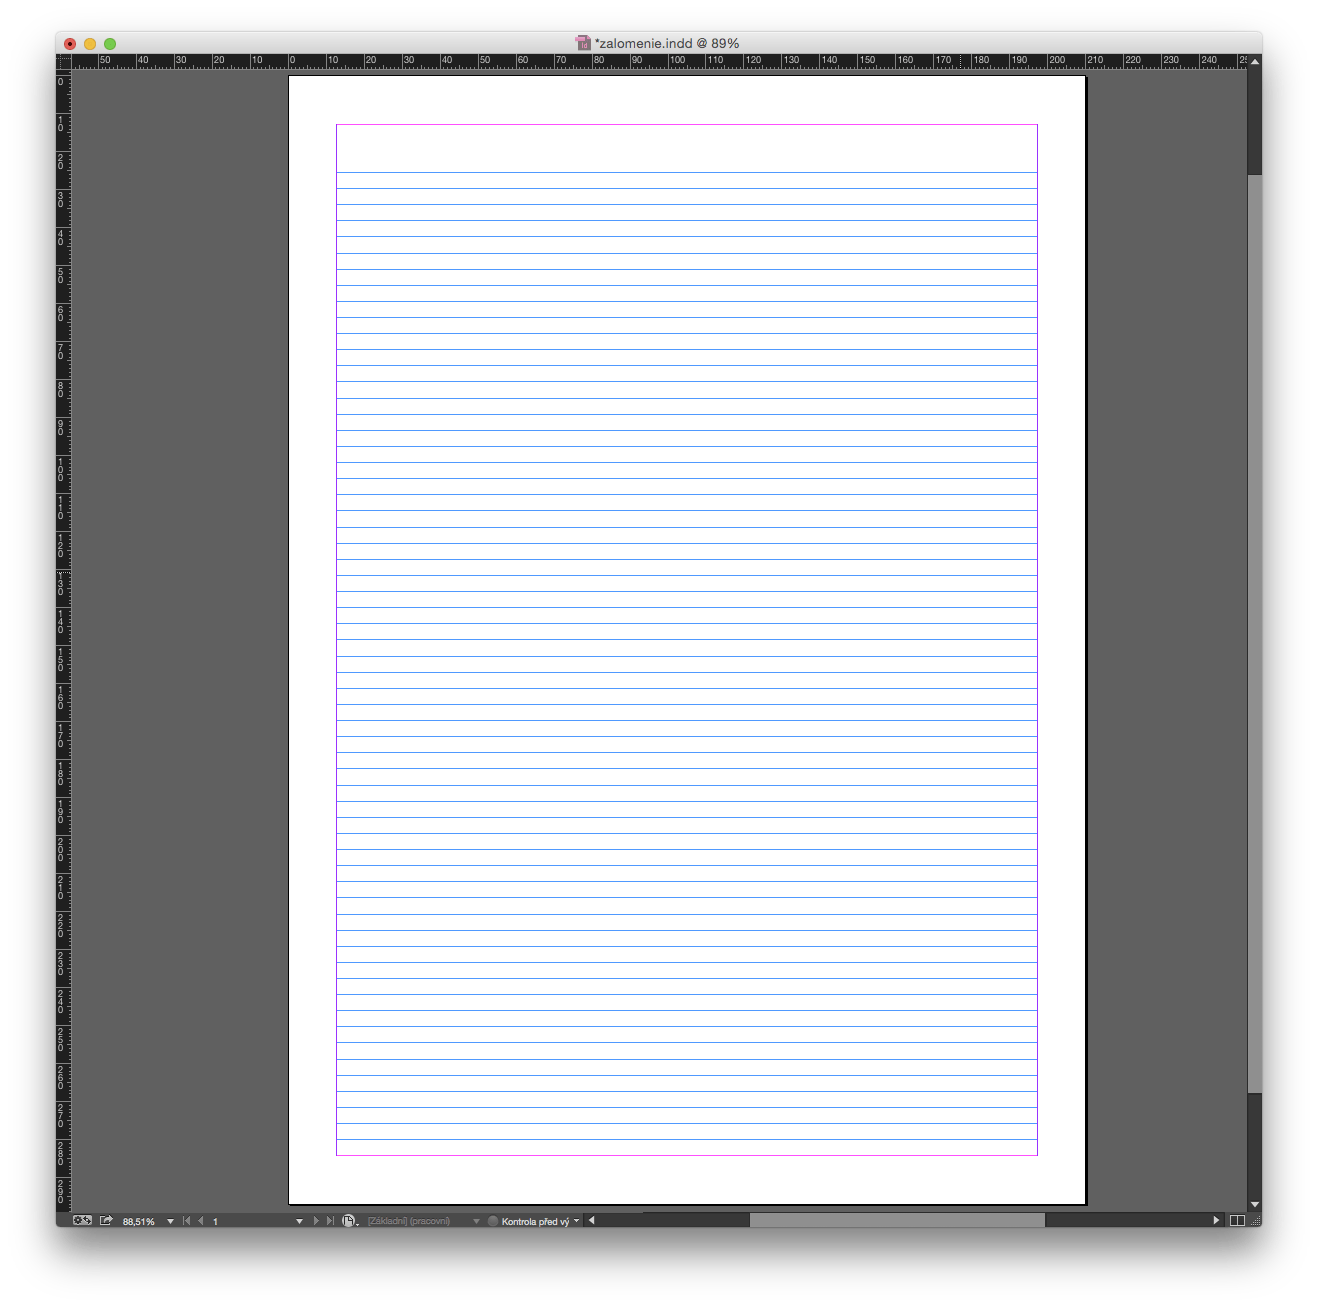 NastavMriezku6 - Skript pre mriežku účiaria – InDesign